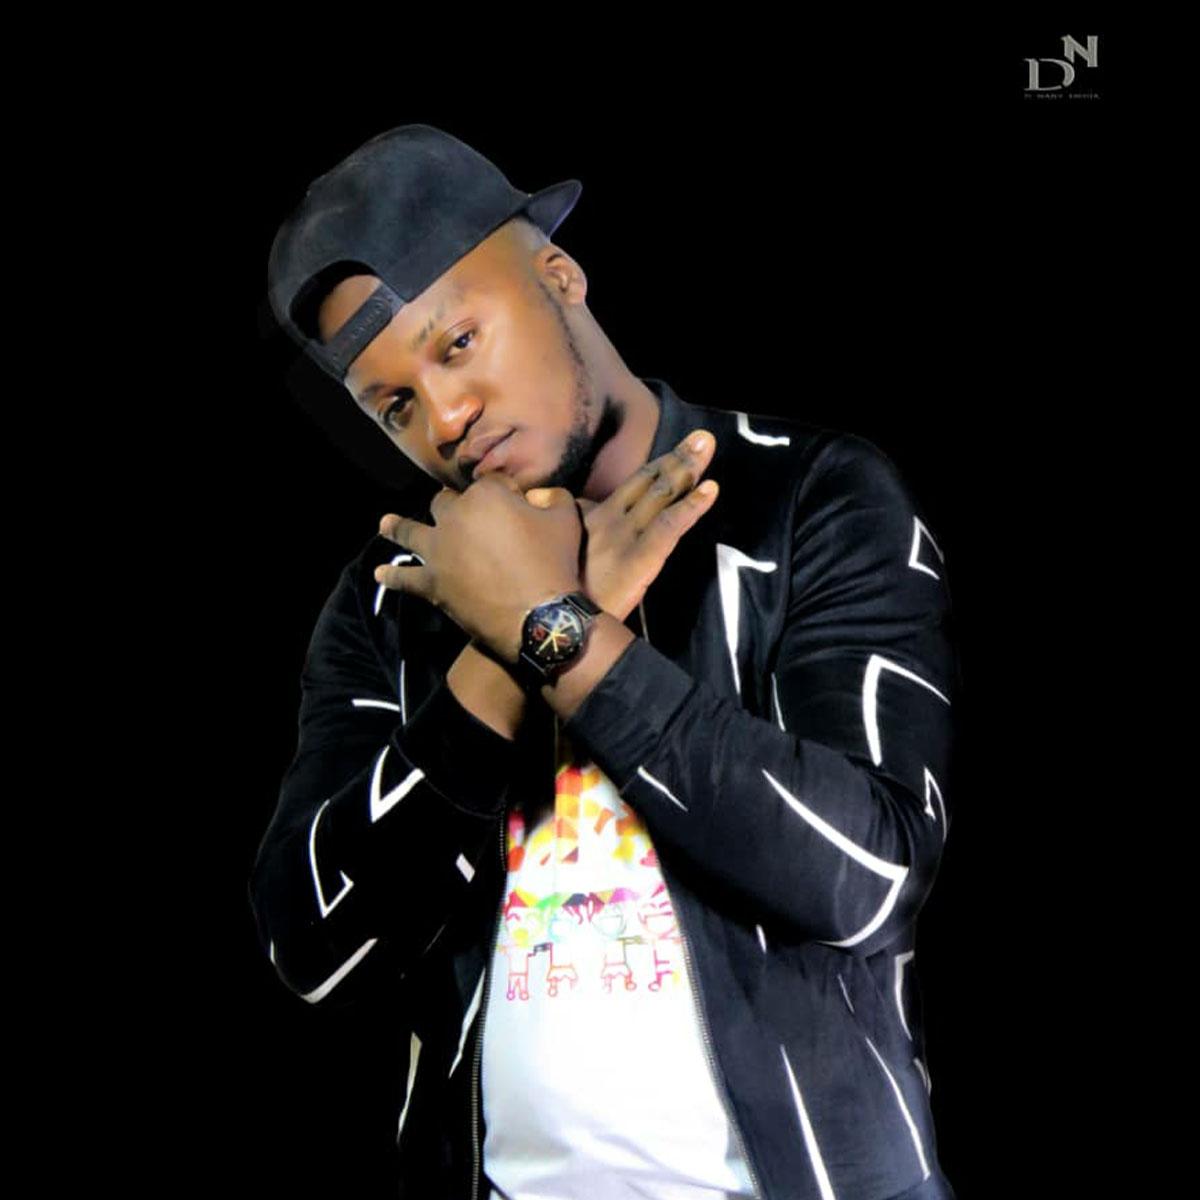 Wasi Bwoy ft. Cash Levels, Lil Ben, T Cee & KUK C - Harder Nabena